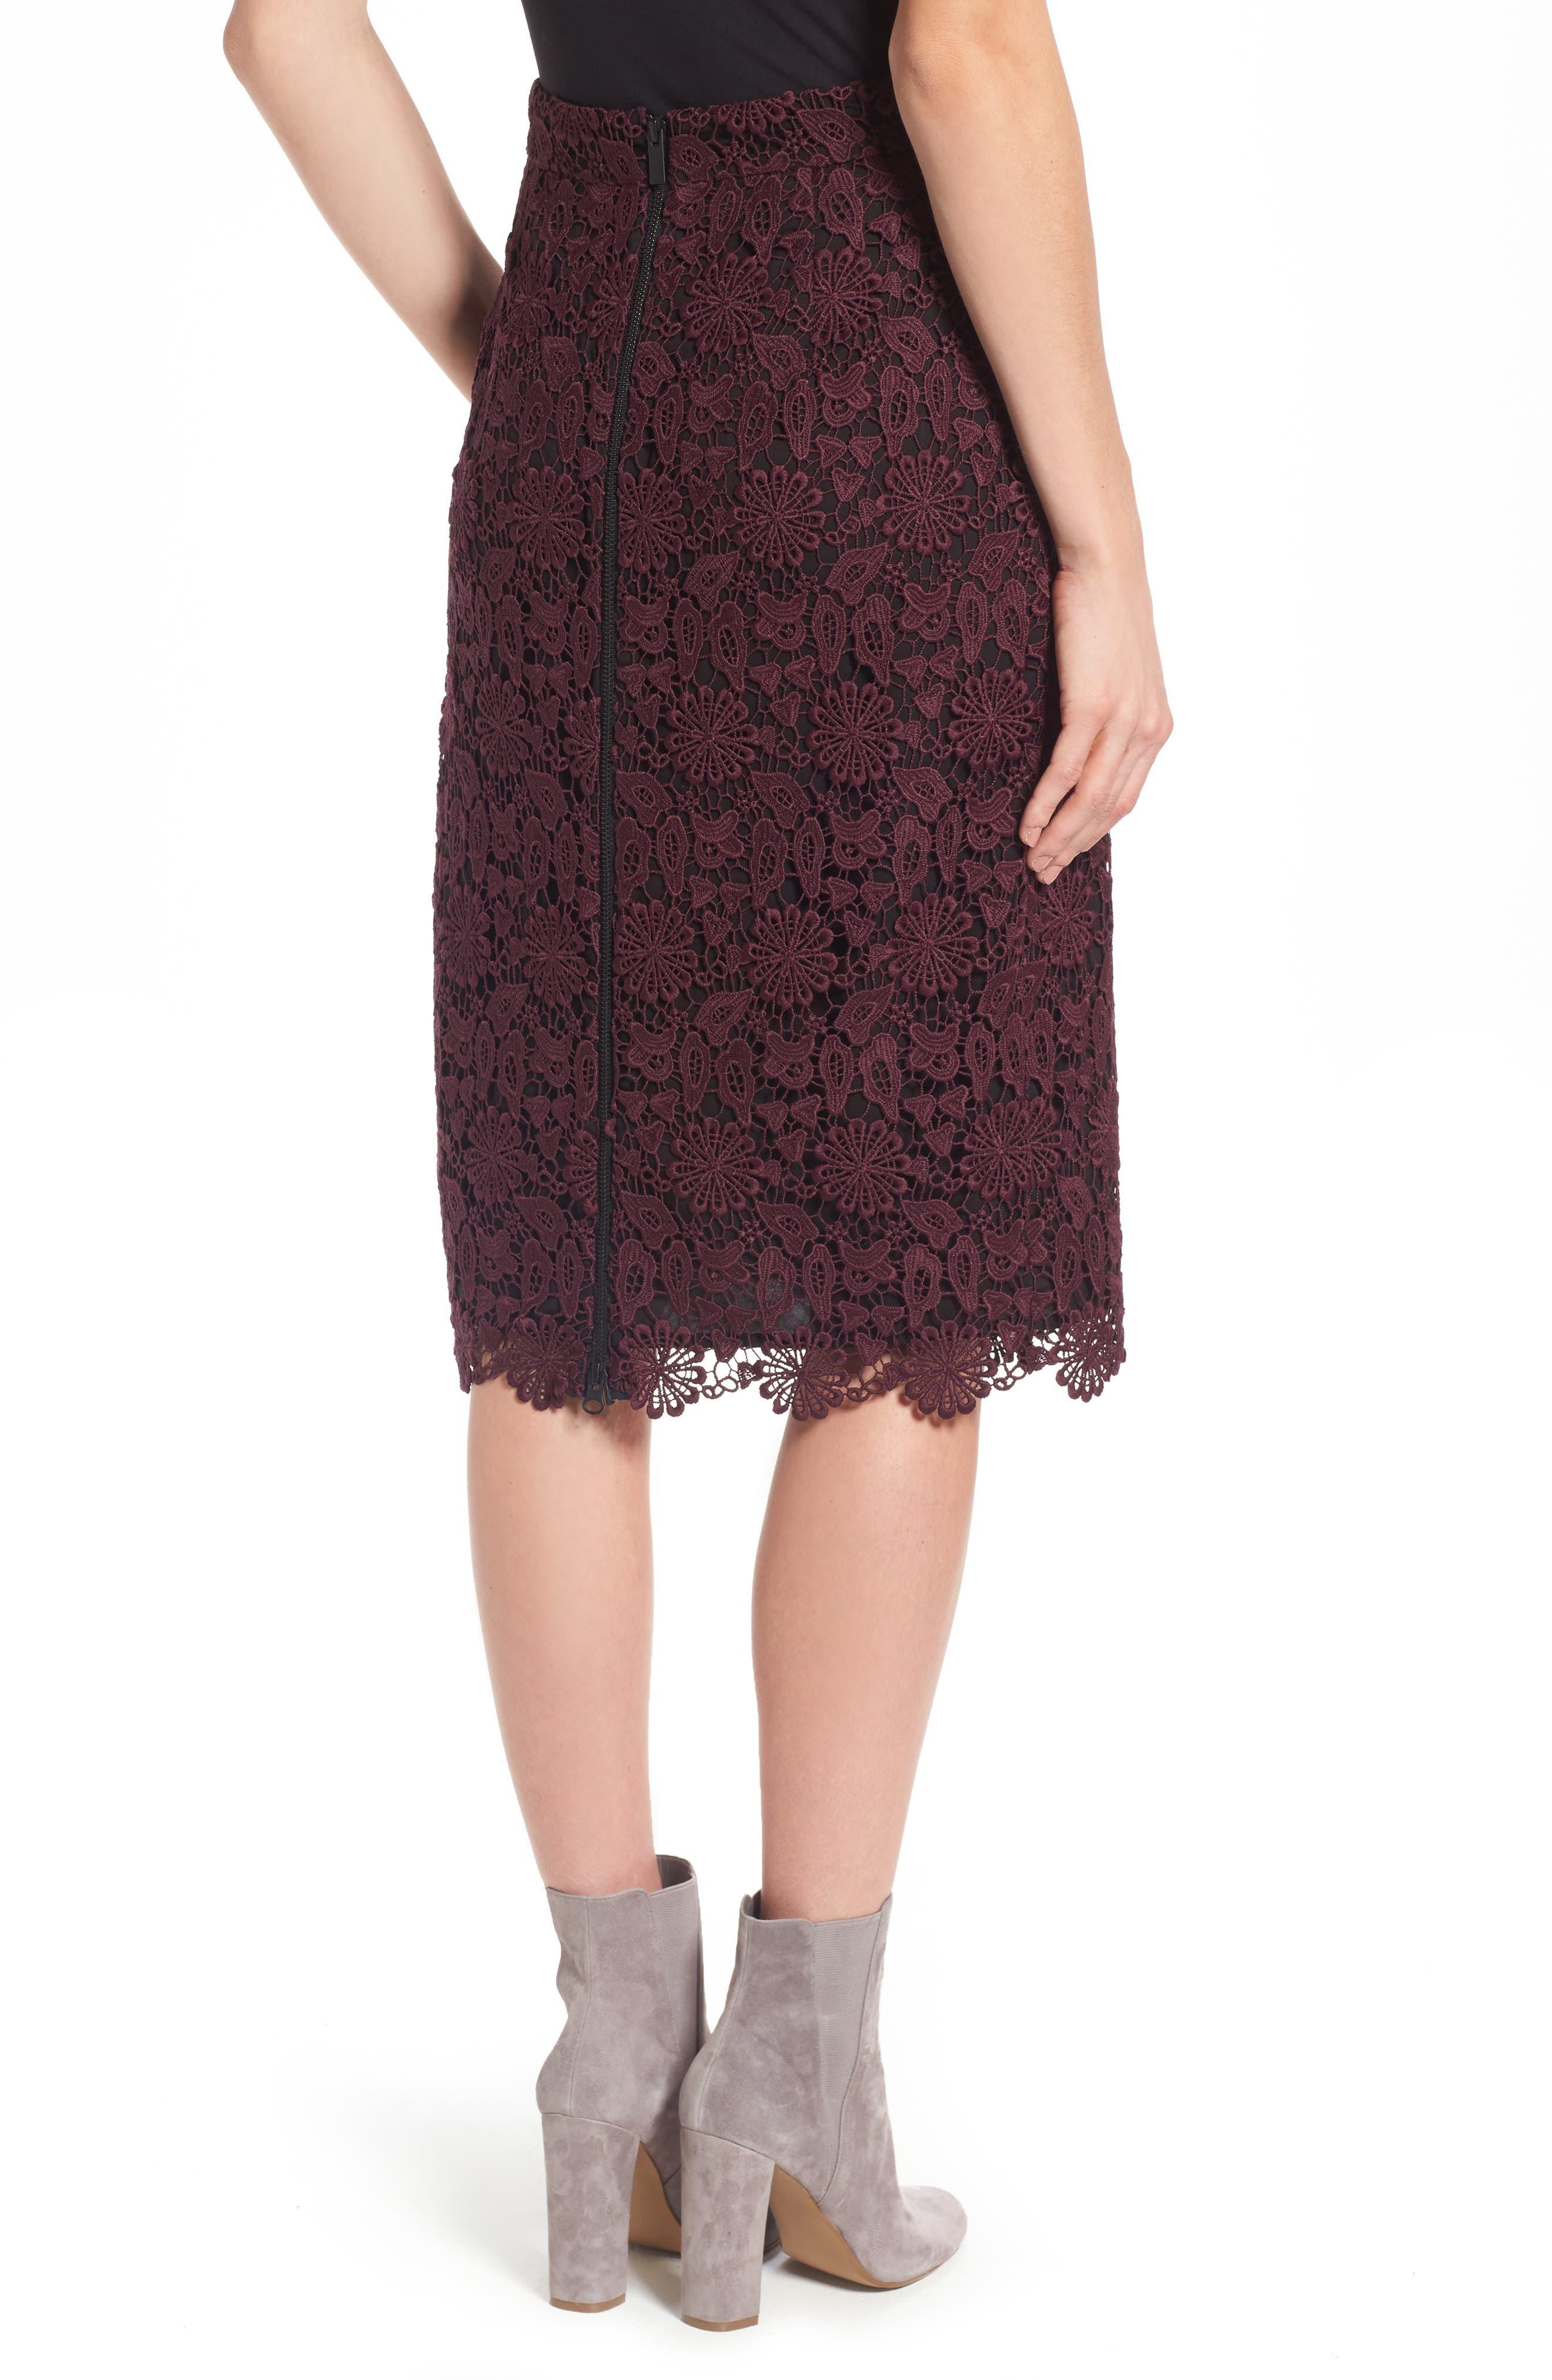 Lace Pencil Skirt,                             Alternate thumbnail 2, color,                             930